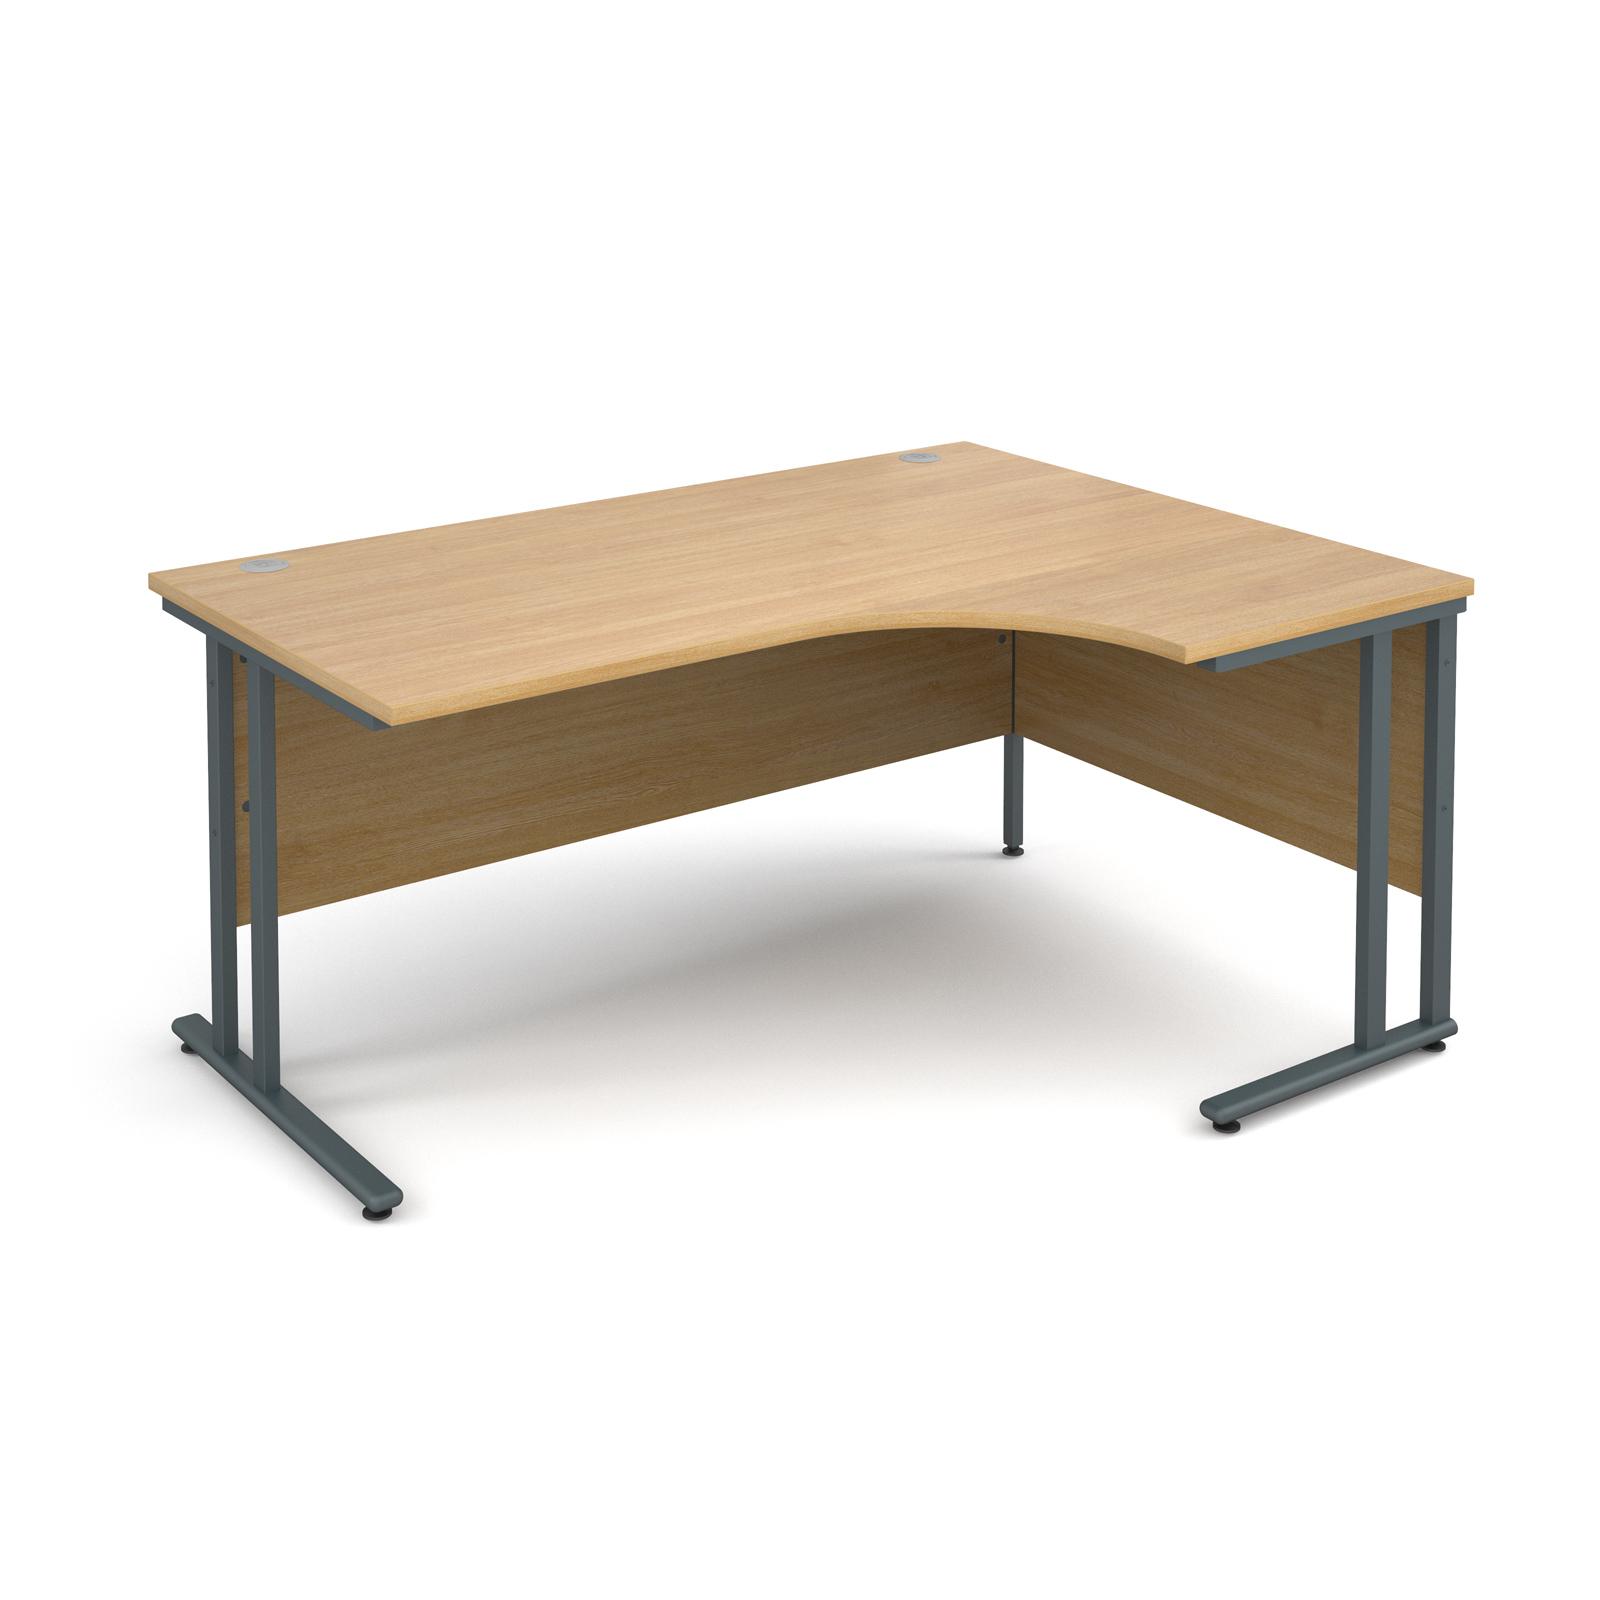 Maestro 25 Gl Right Hand Ergonomic Desk 1600mm Graphite Cantilever Frame Oak Top Stakelum Office Supplies Stationery Ireland School Books